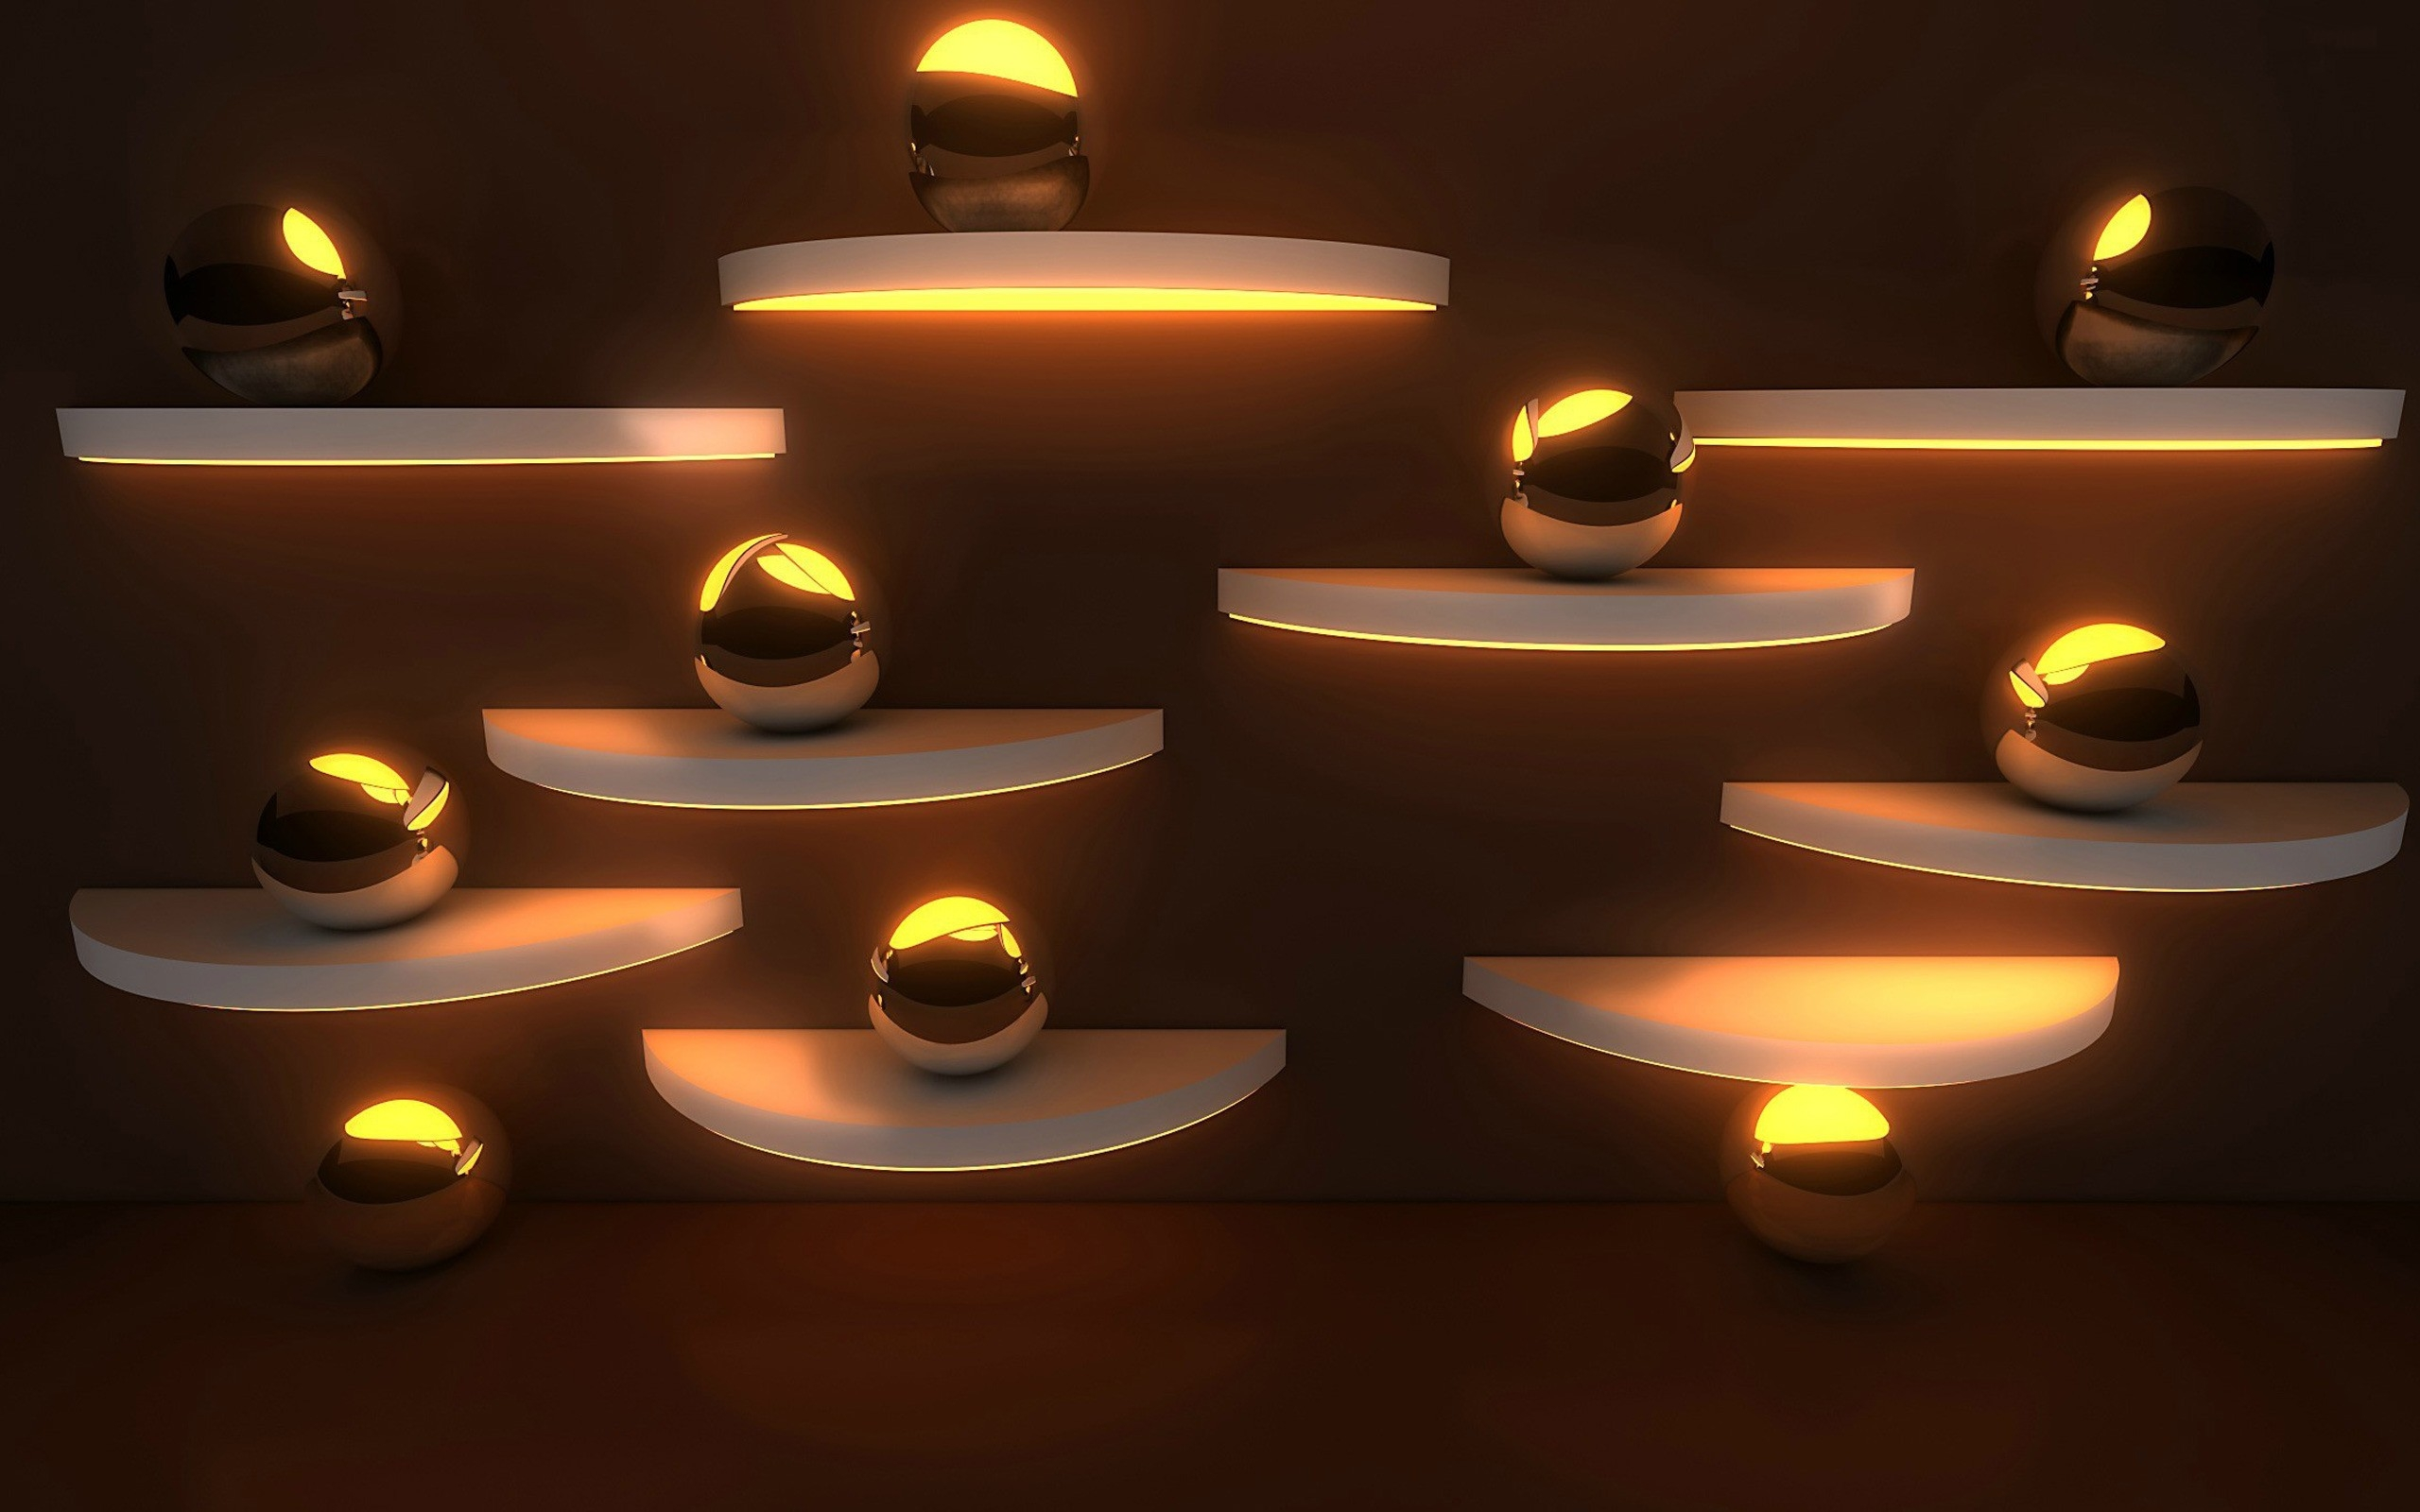 обои стена, полки, шары, подсветка картинки фото